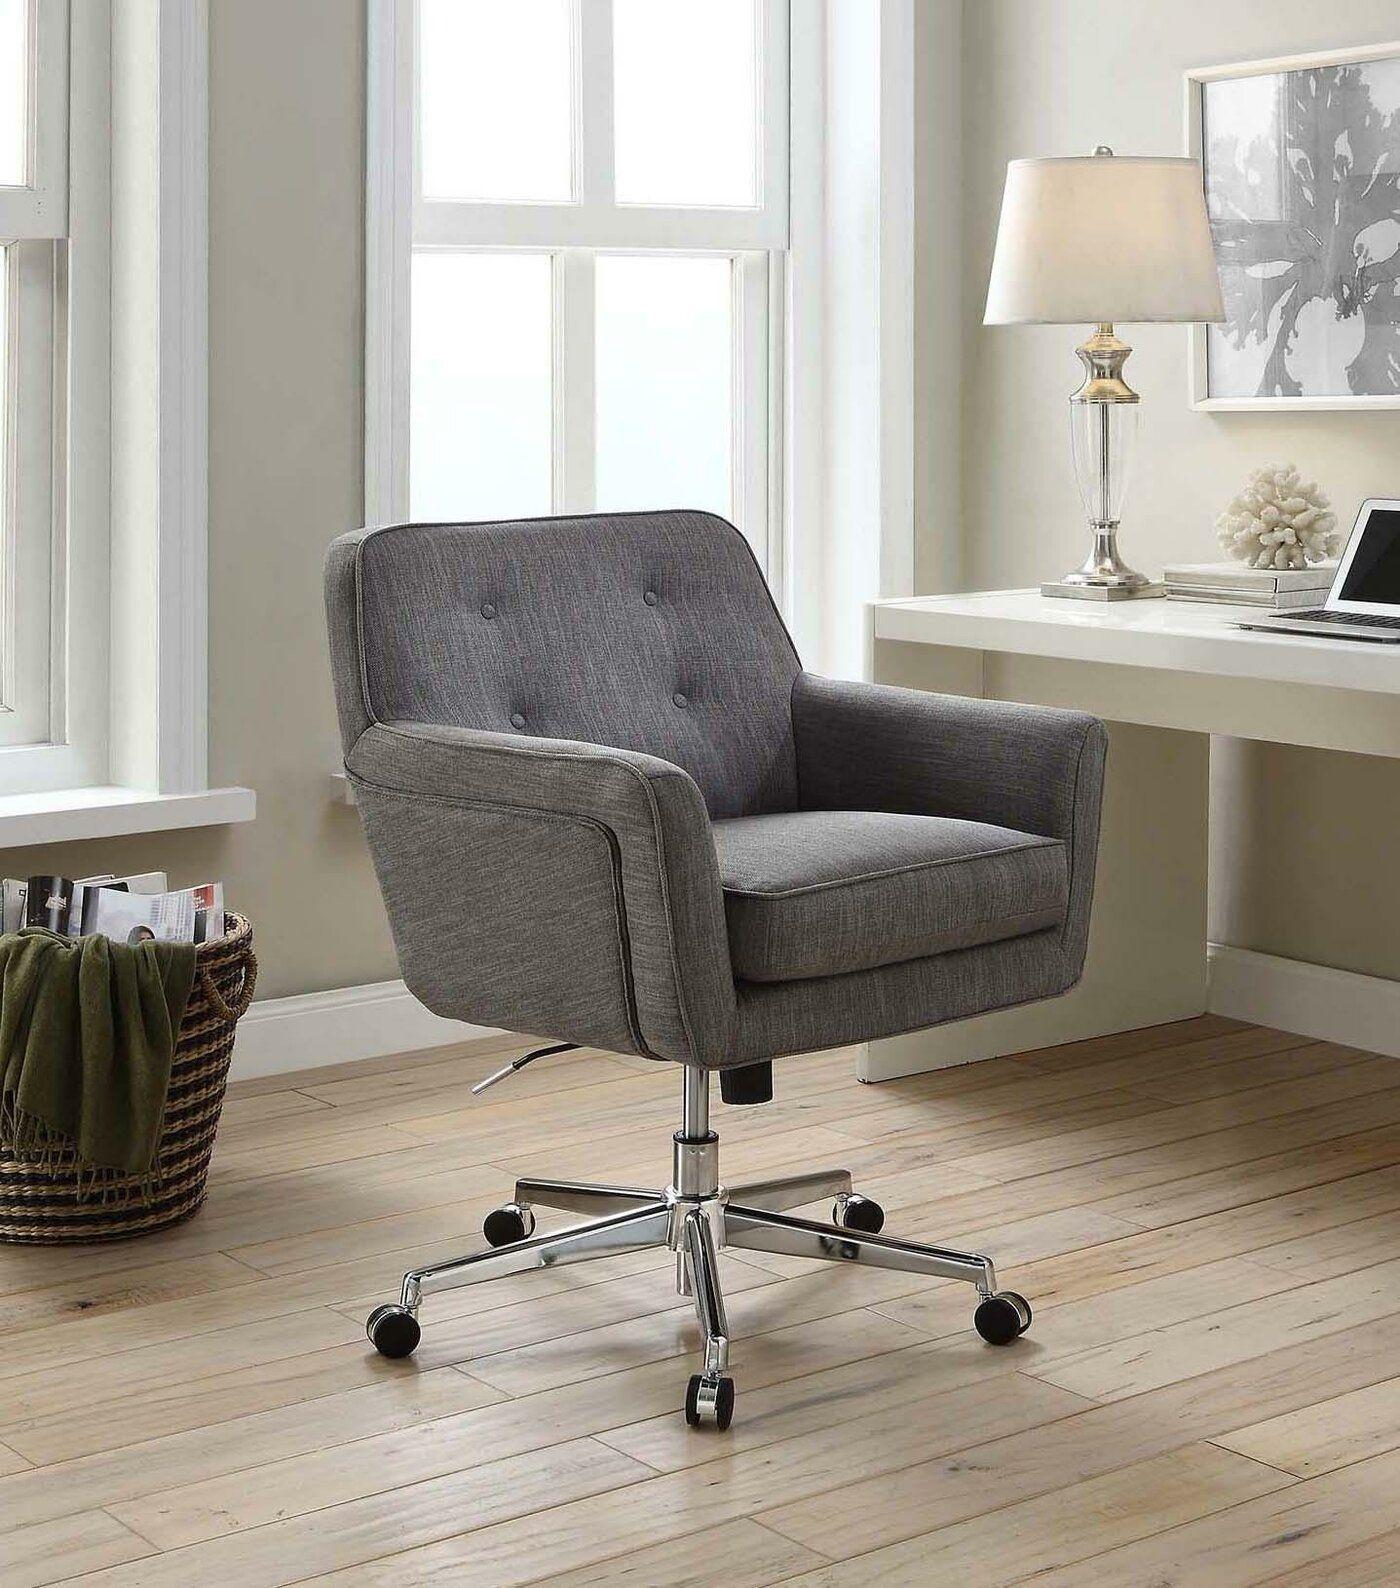 Serta Ashland Task Chair Home Office Chairs Furniture Home